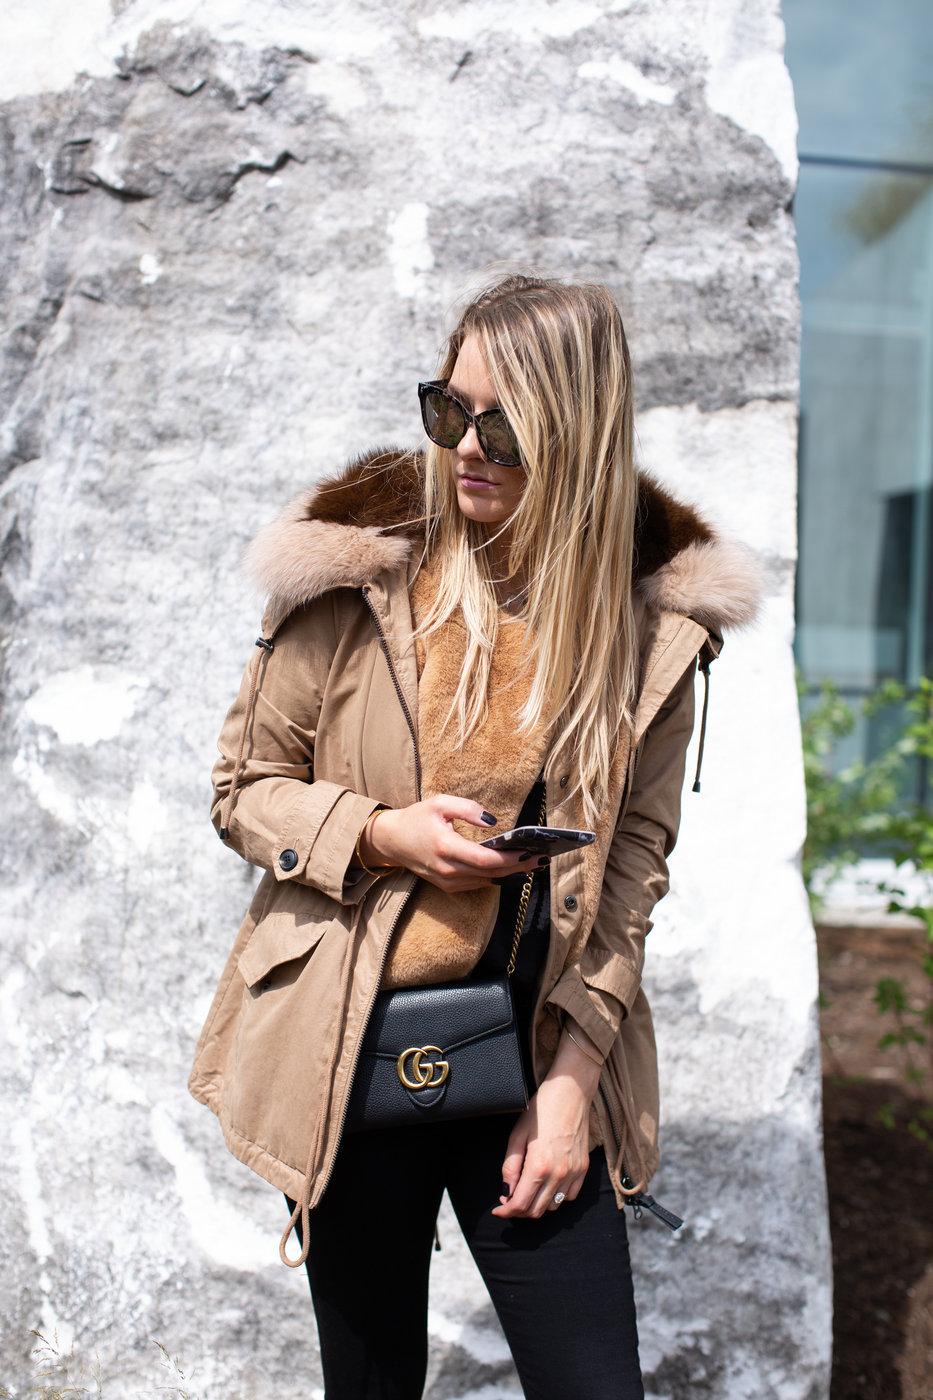 1 person, girl wearing tan coat with fur collar